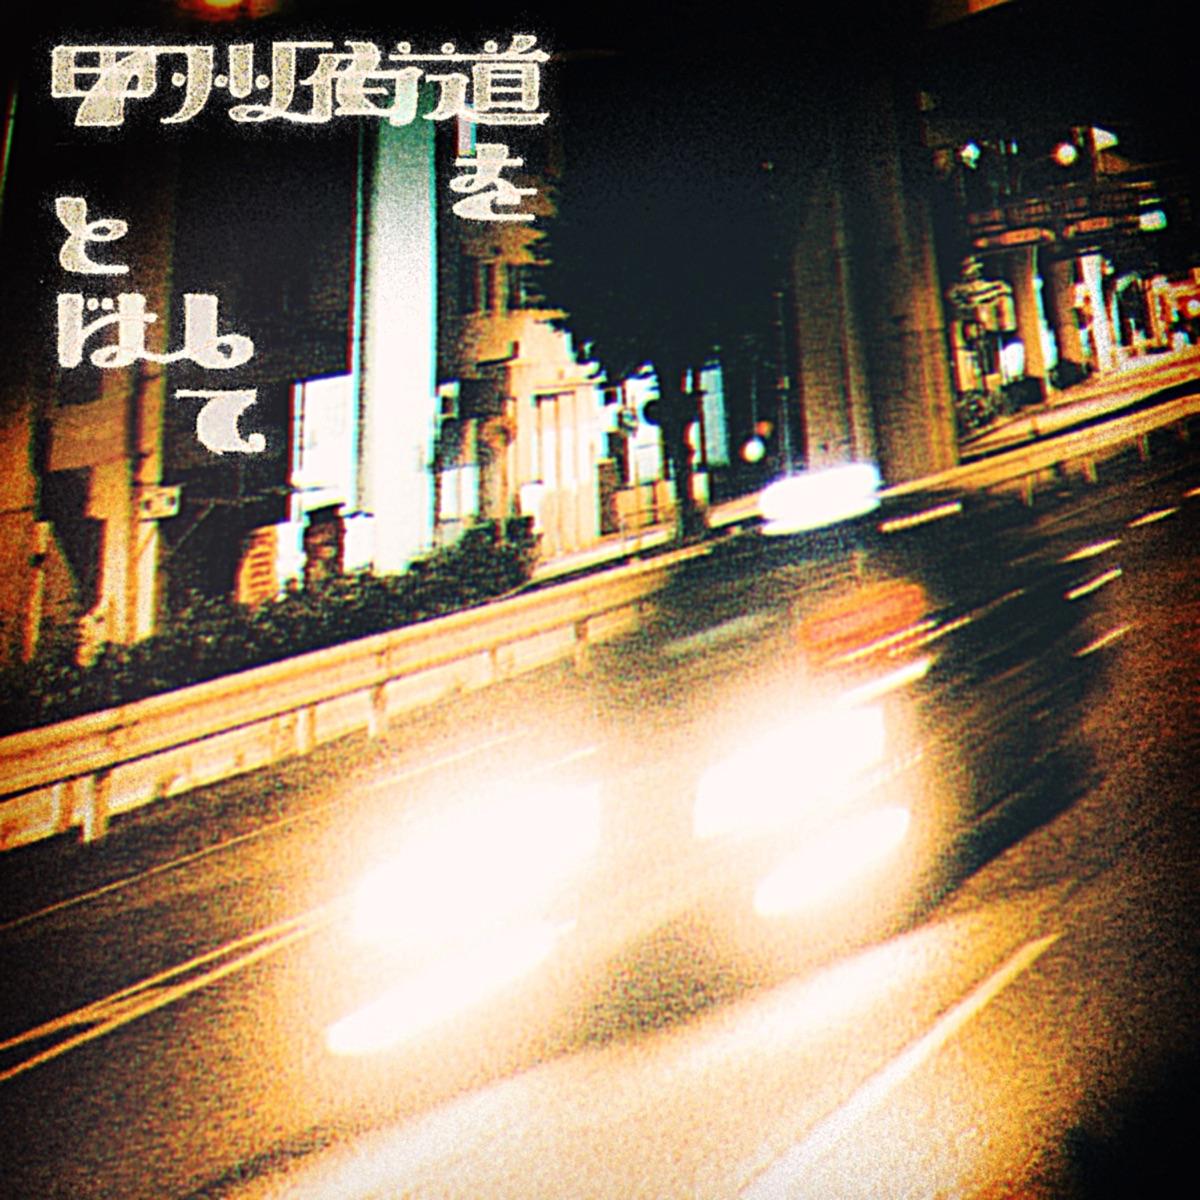 『Mega Shinnosuke - 甲州街道をとばして』収録の『甲州街道をとばして』ジャケット